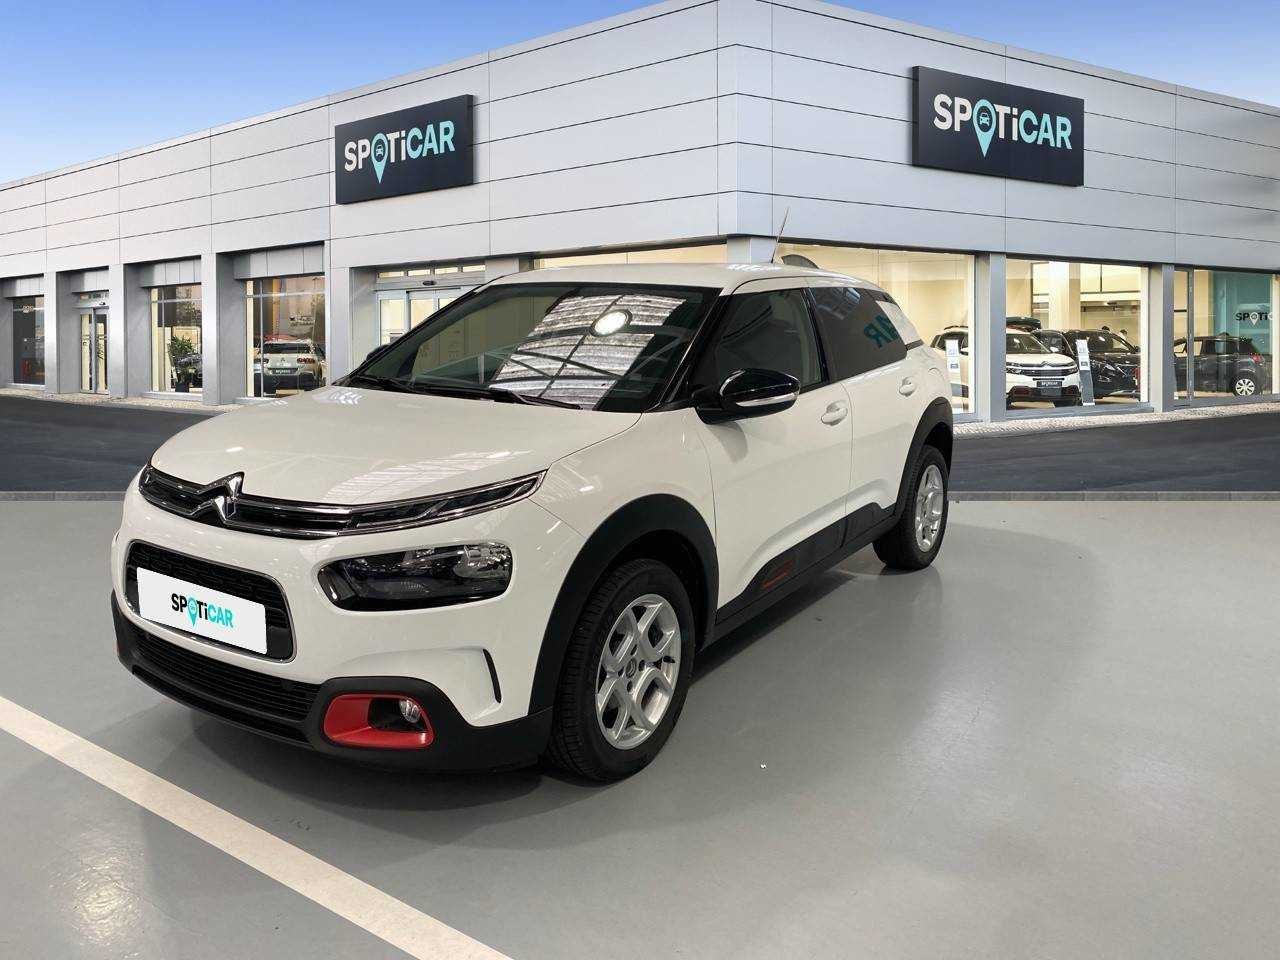 Citroën C4 Cactus ocasión segunda mano 2020 Gasolina por 16.100€ en Coruña